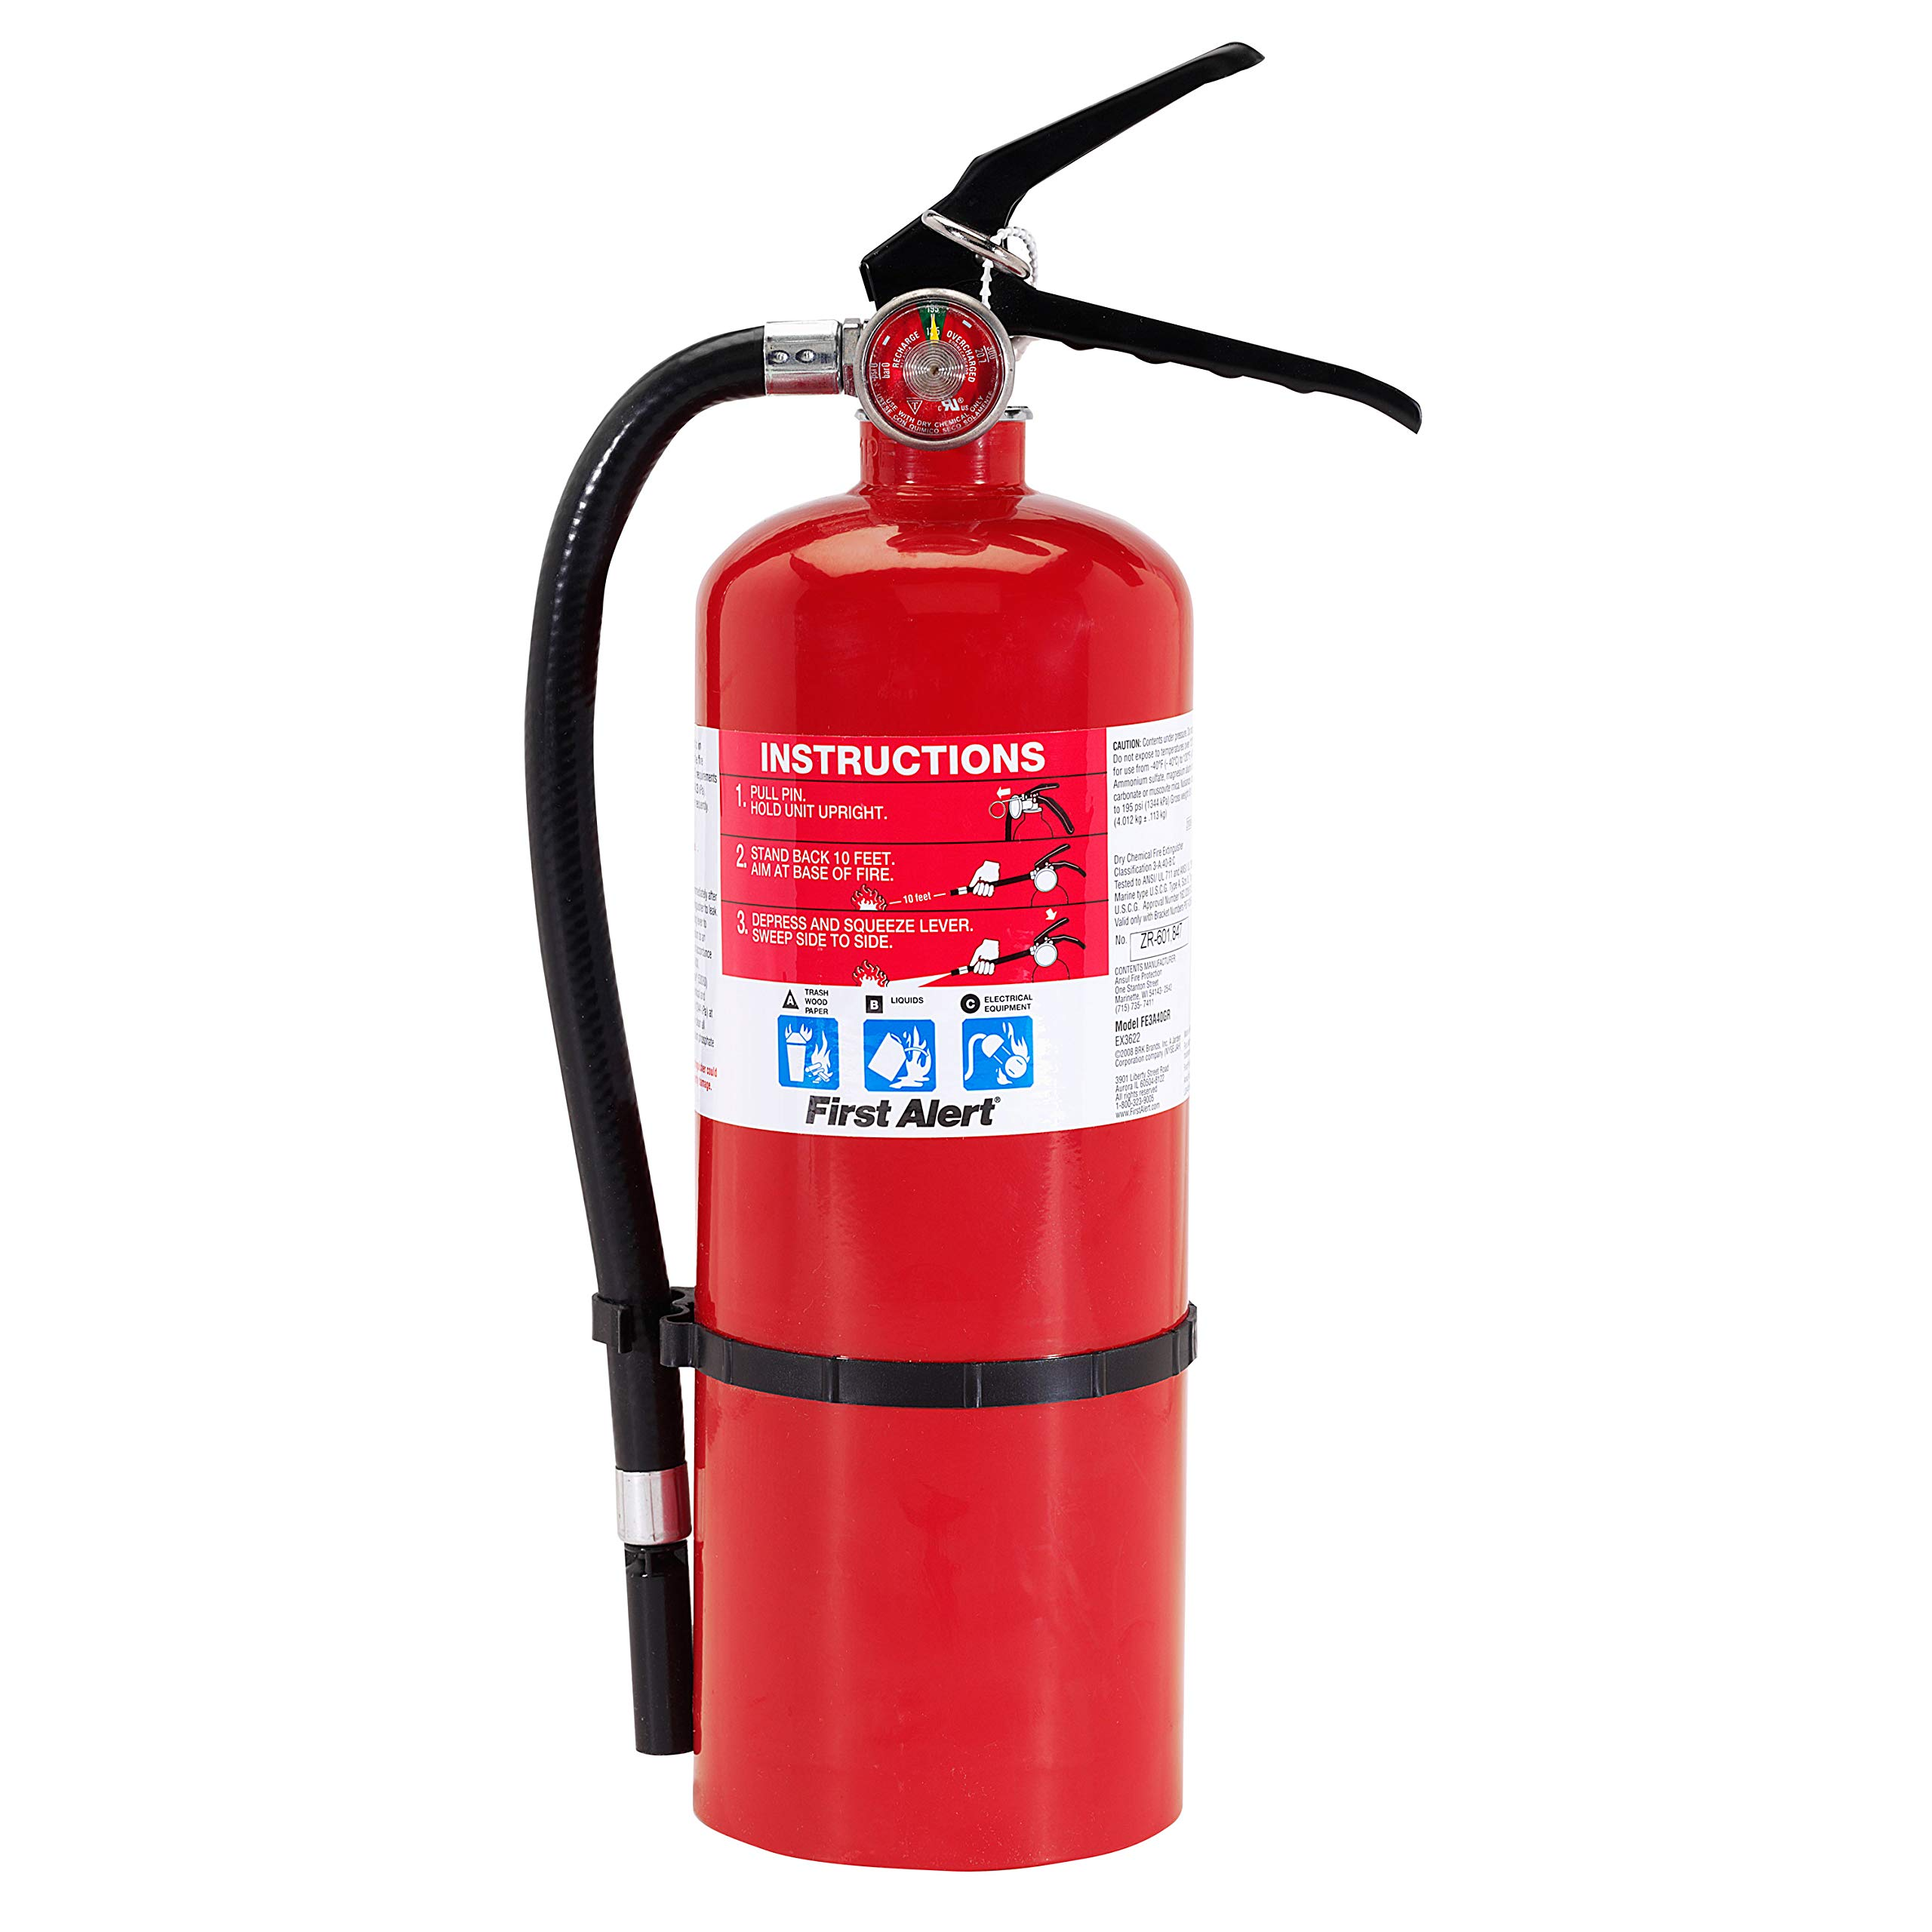 First Alert Fire Extinguisher | Professional FireExtinguisher, Red, 5 lb, PRO5 by First Alert